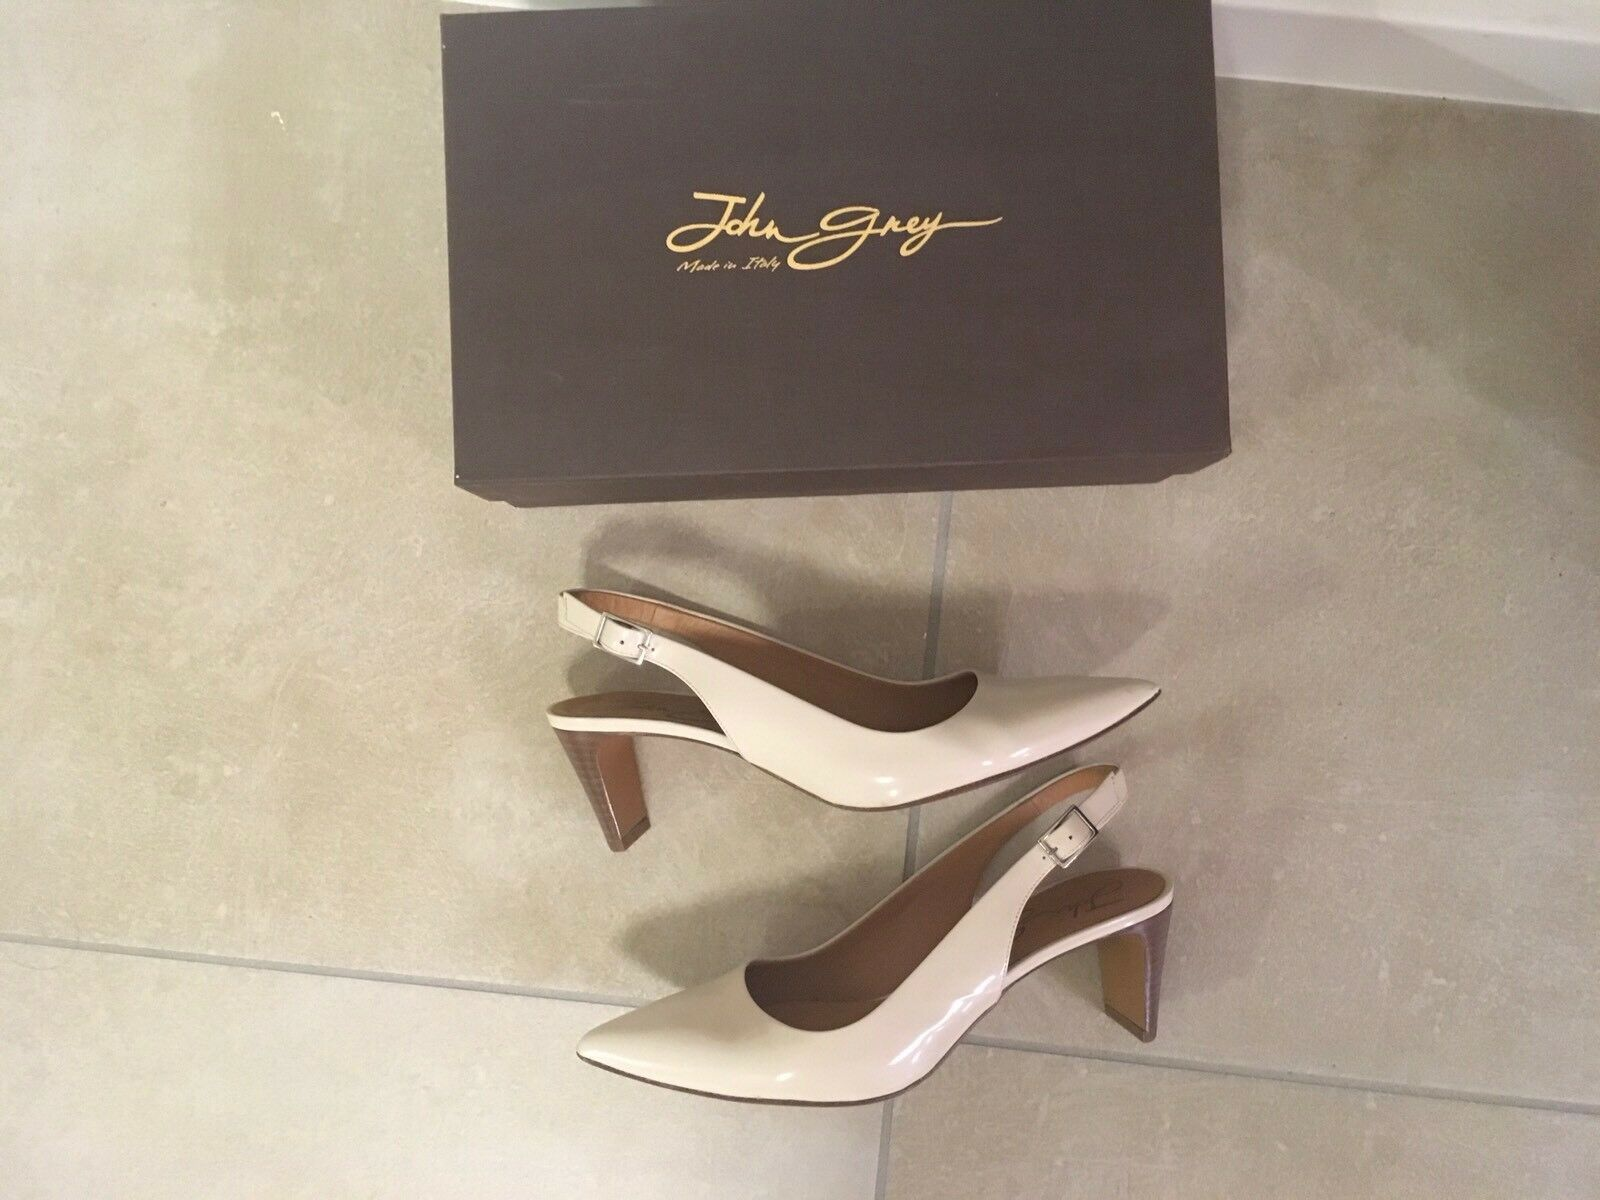 John grau  Leder Schuhe Damen Nude Nude Nude Gr. 37,5 Flex Memory Carbon Soft a7f1a5